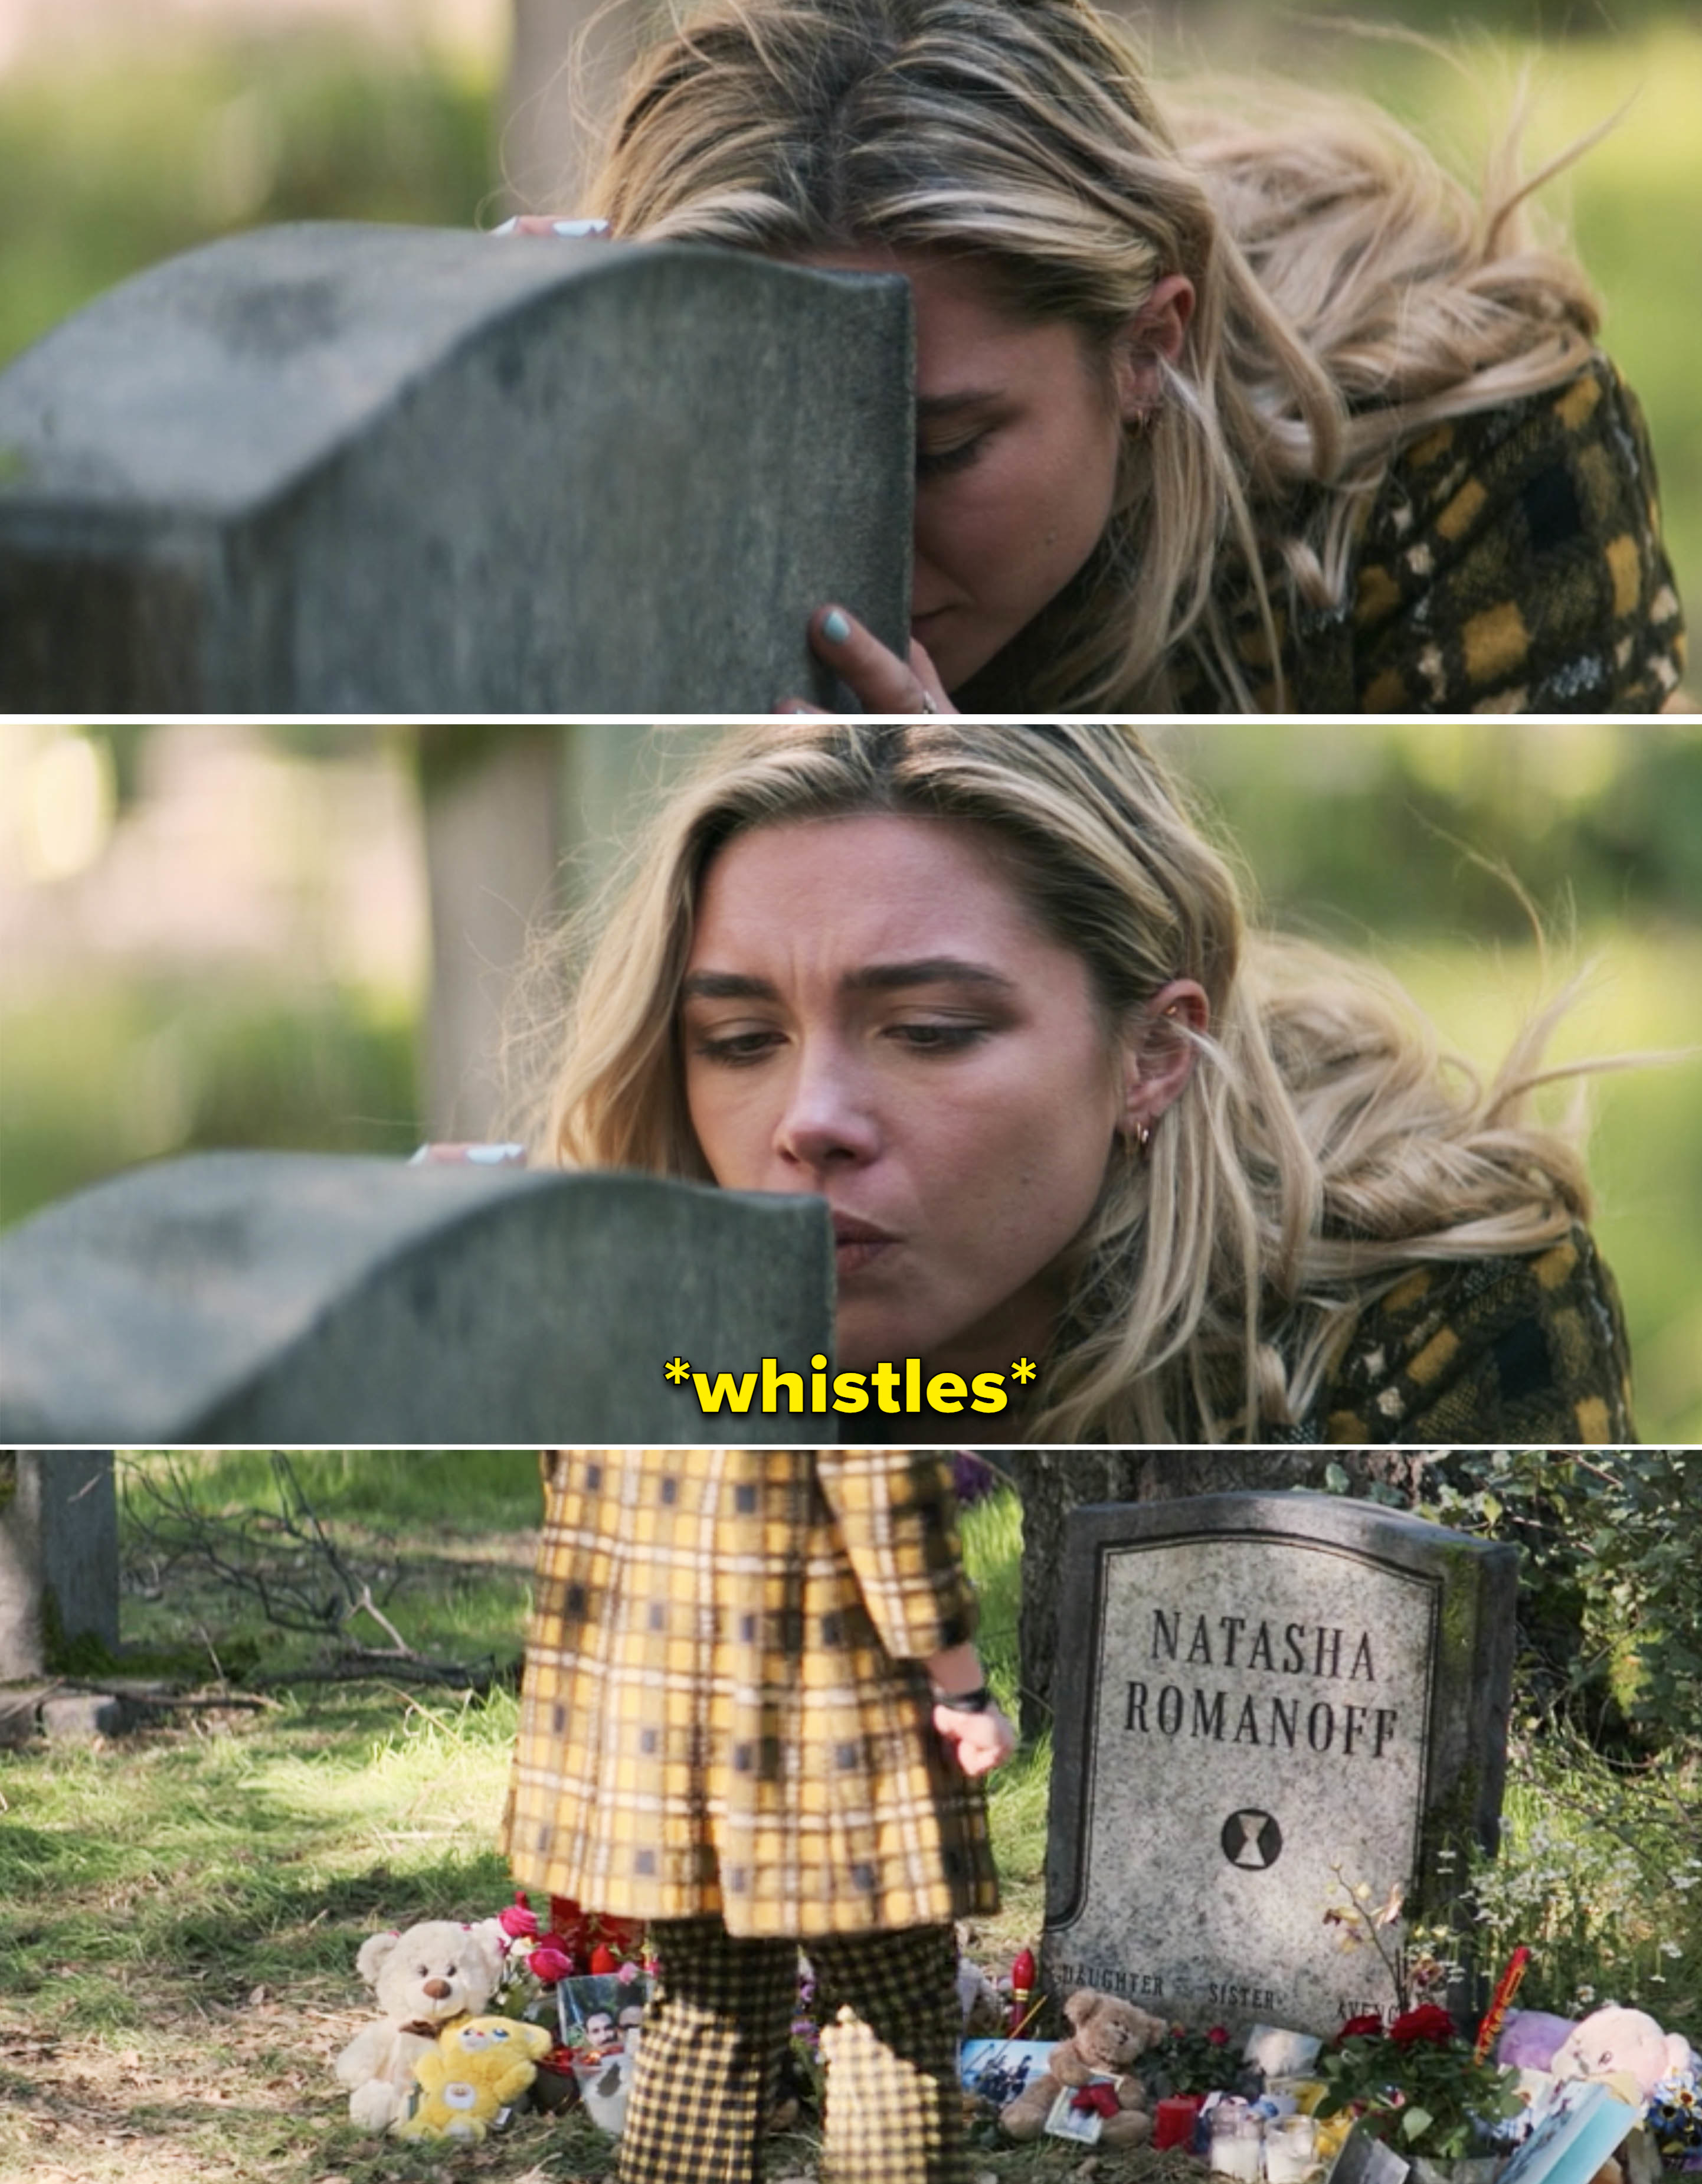 Yelena whistling at Natasha's grave